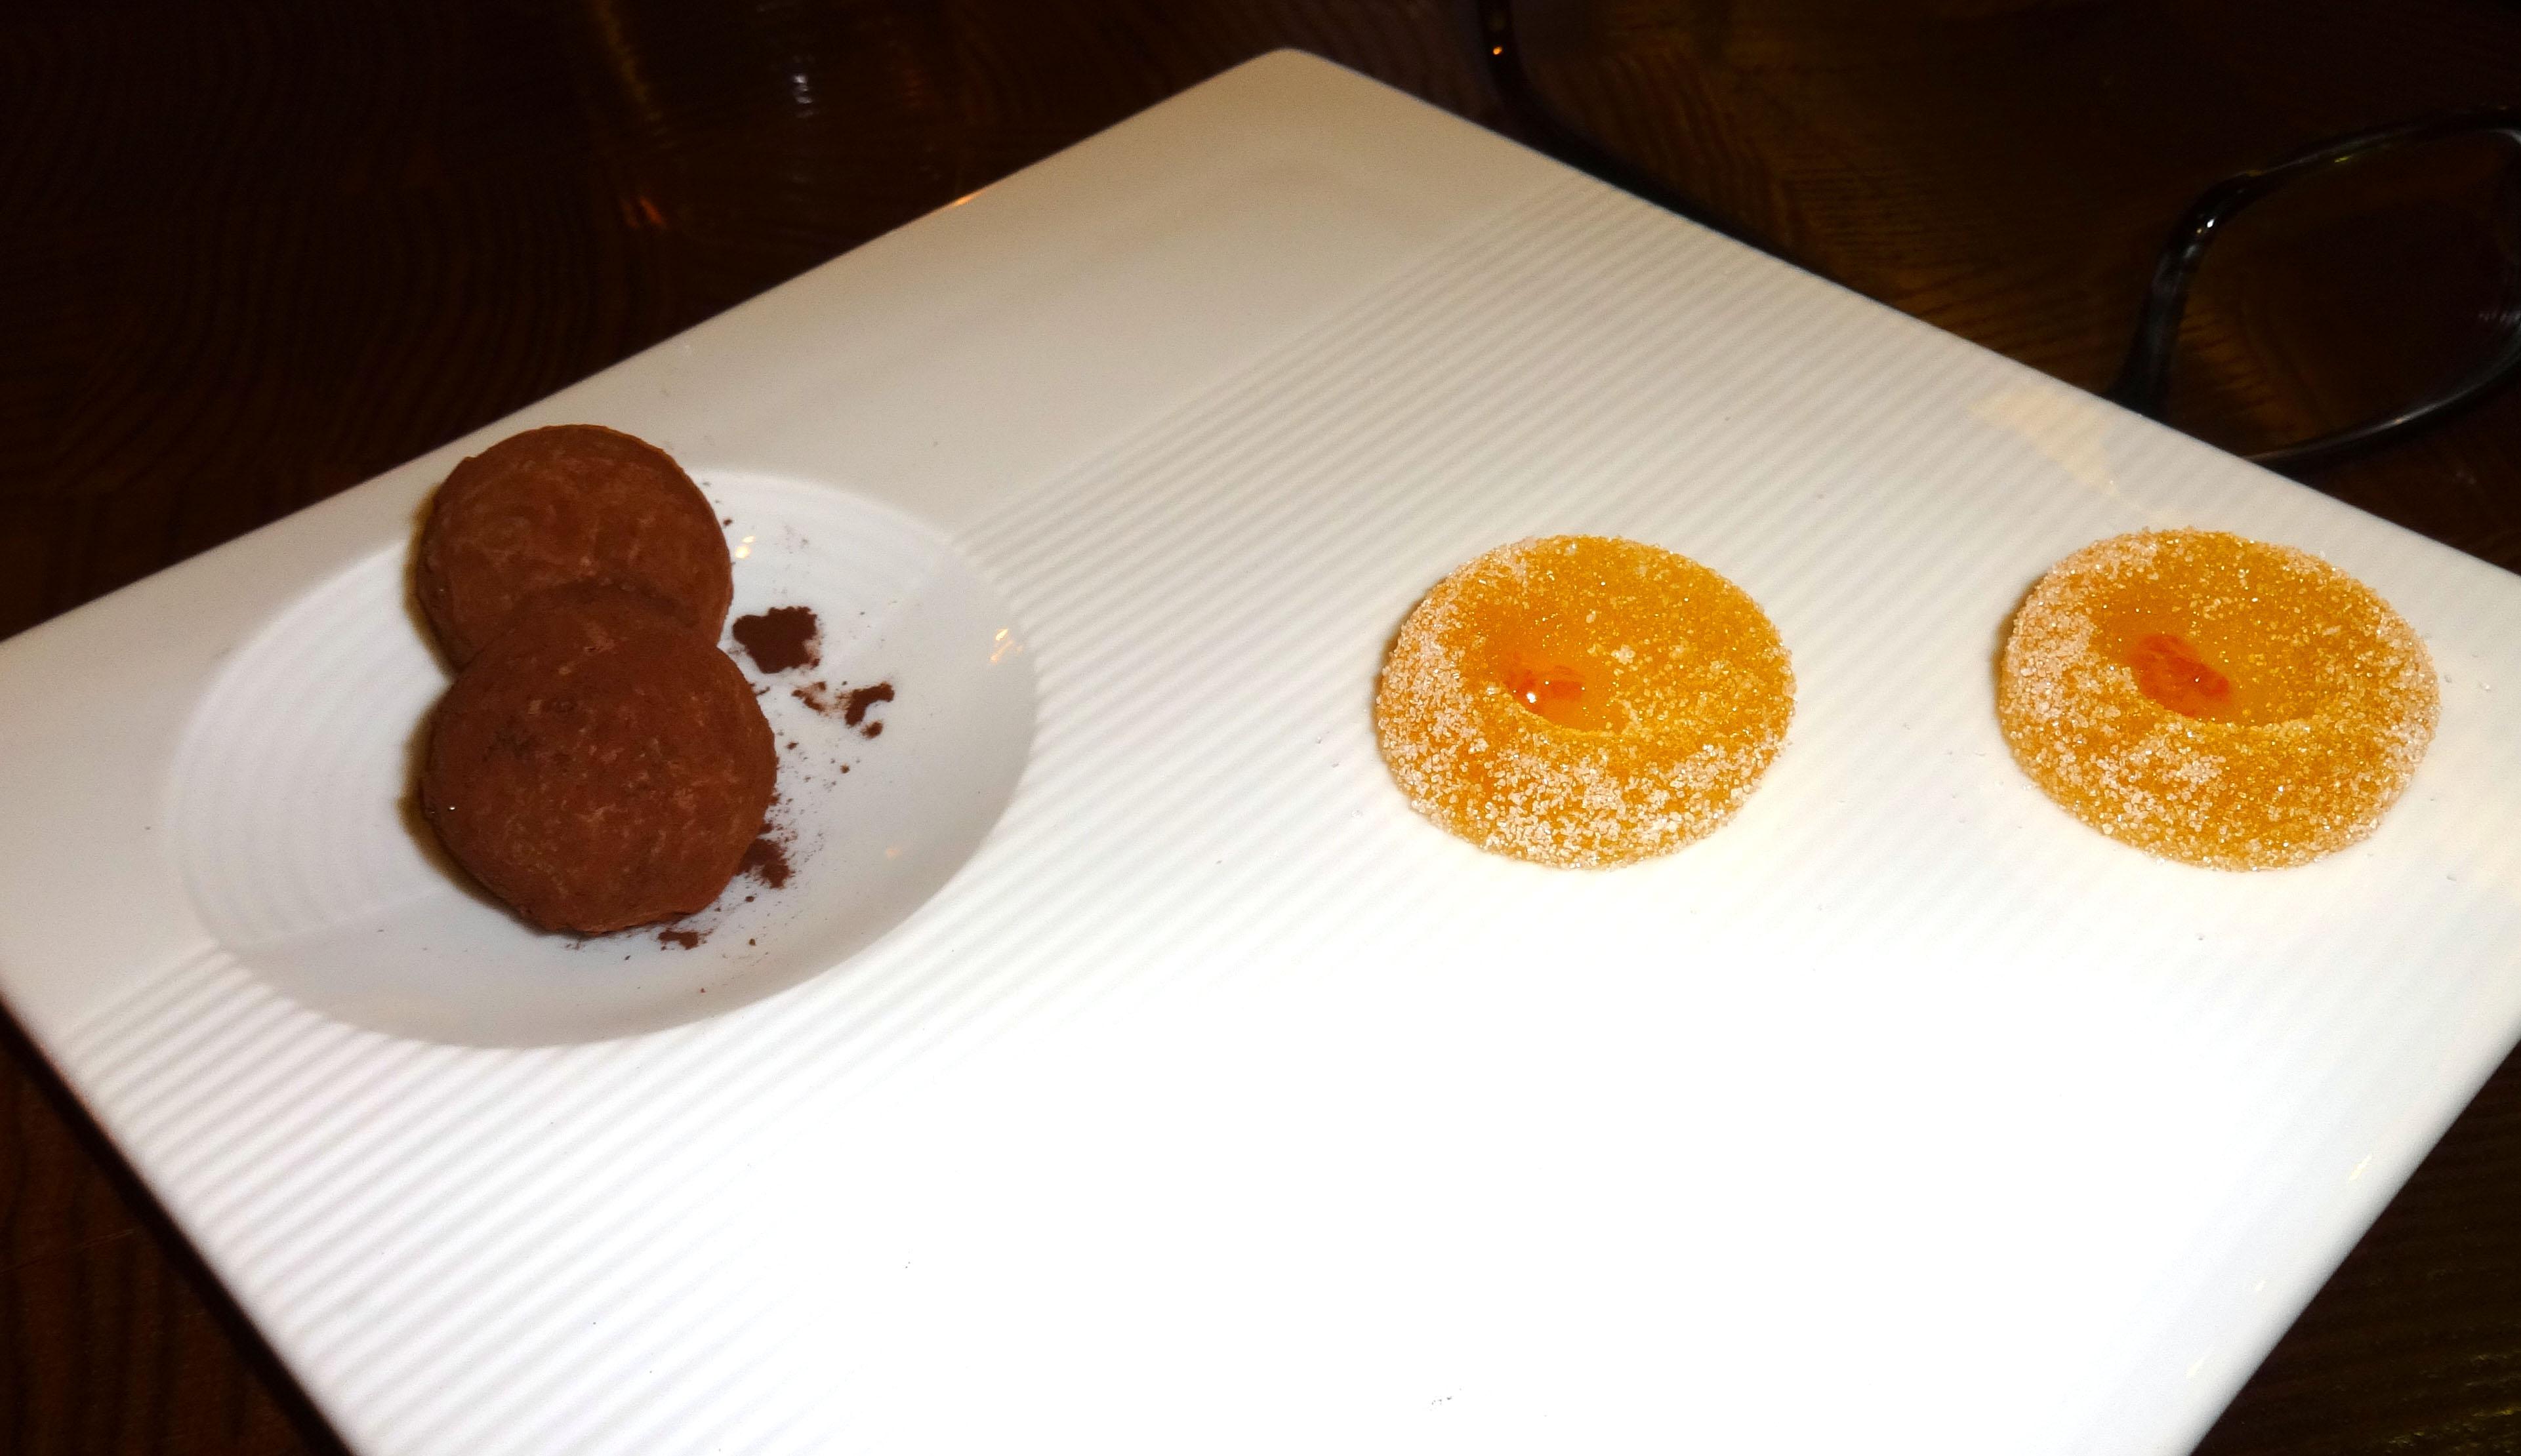 Complimentary after dinner chocolates Batard